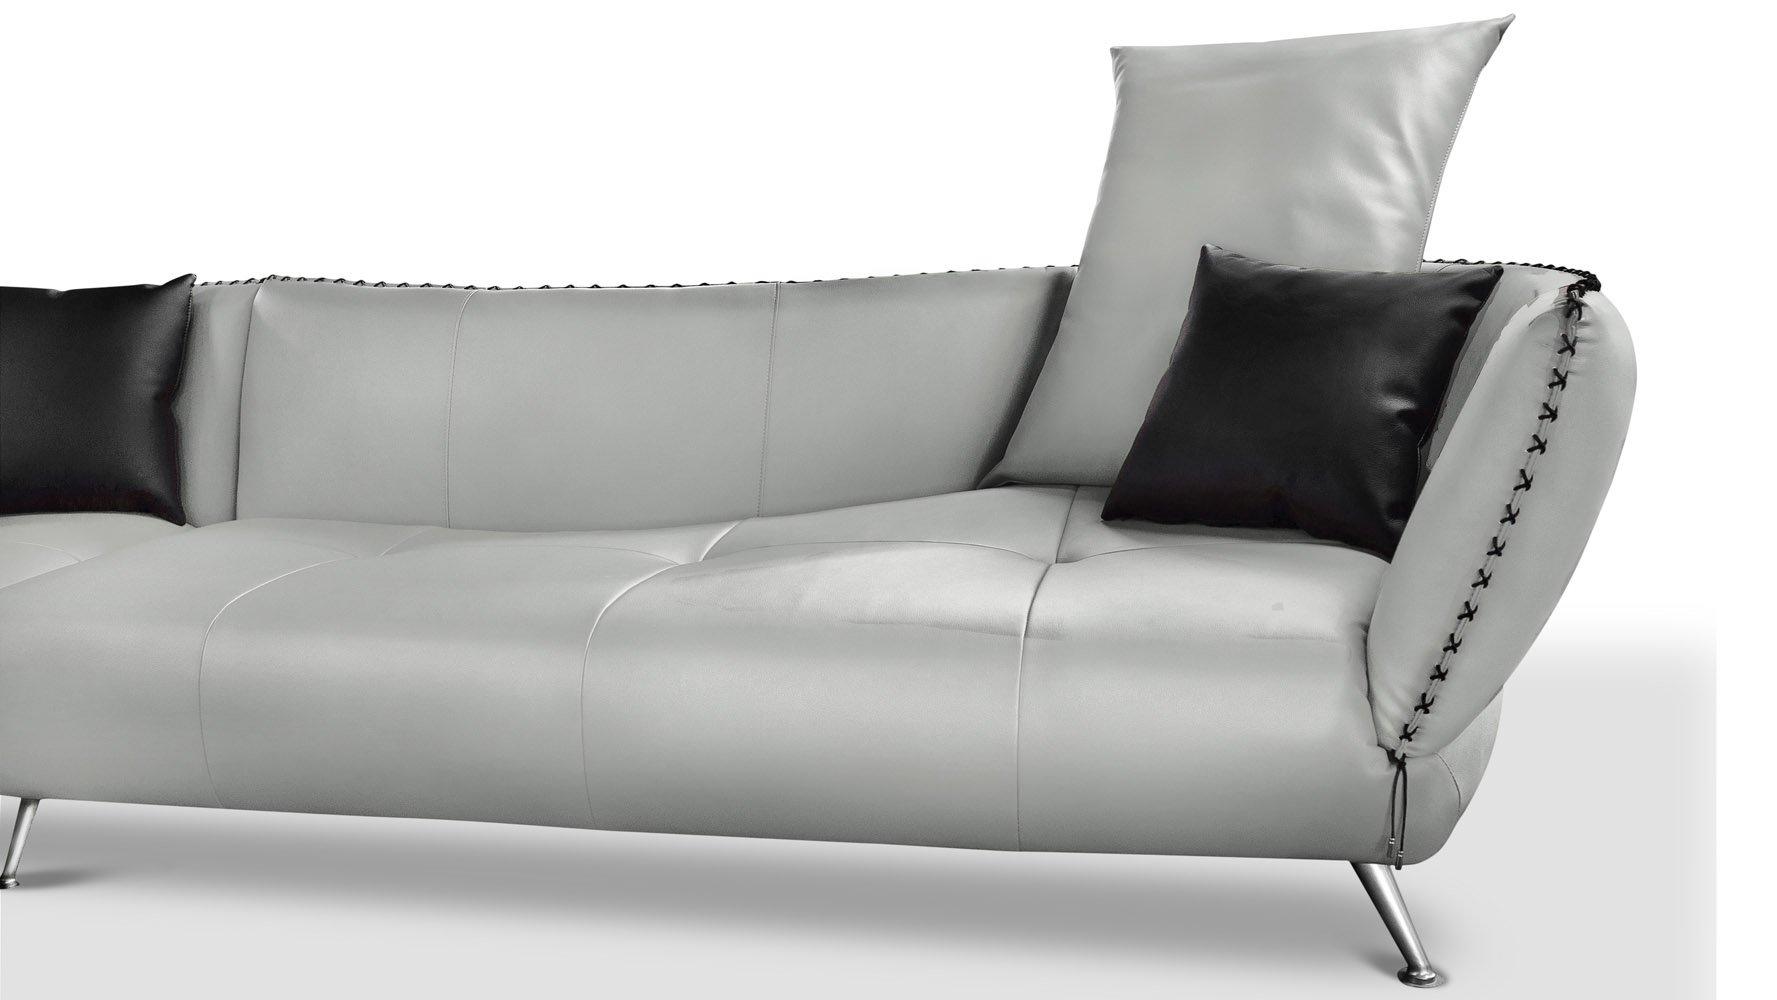 vitali aniline top grain leather sectional